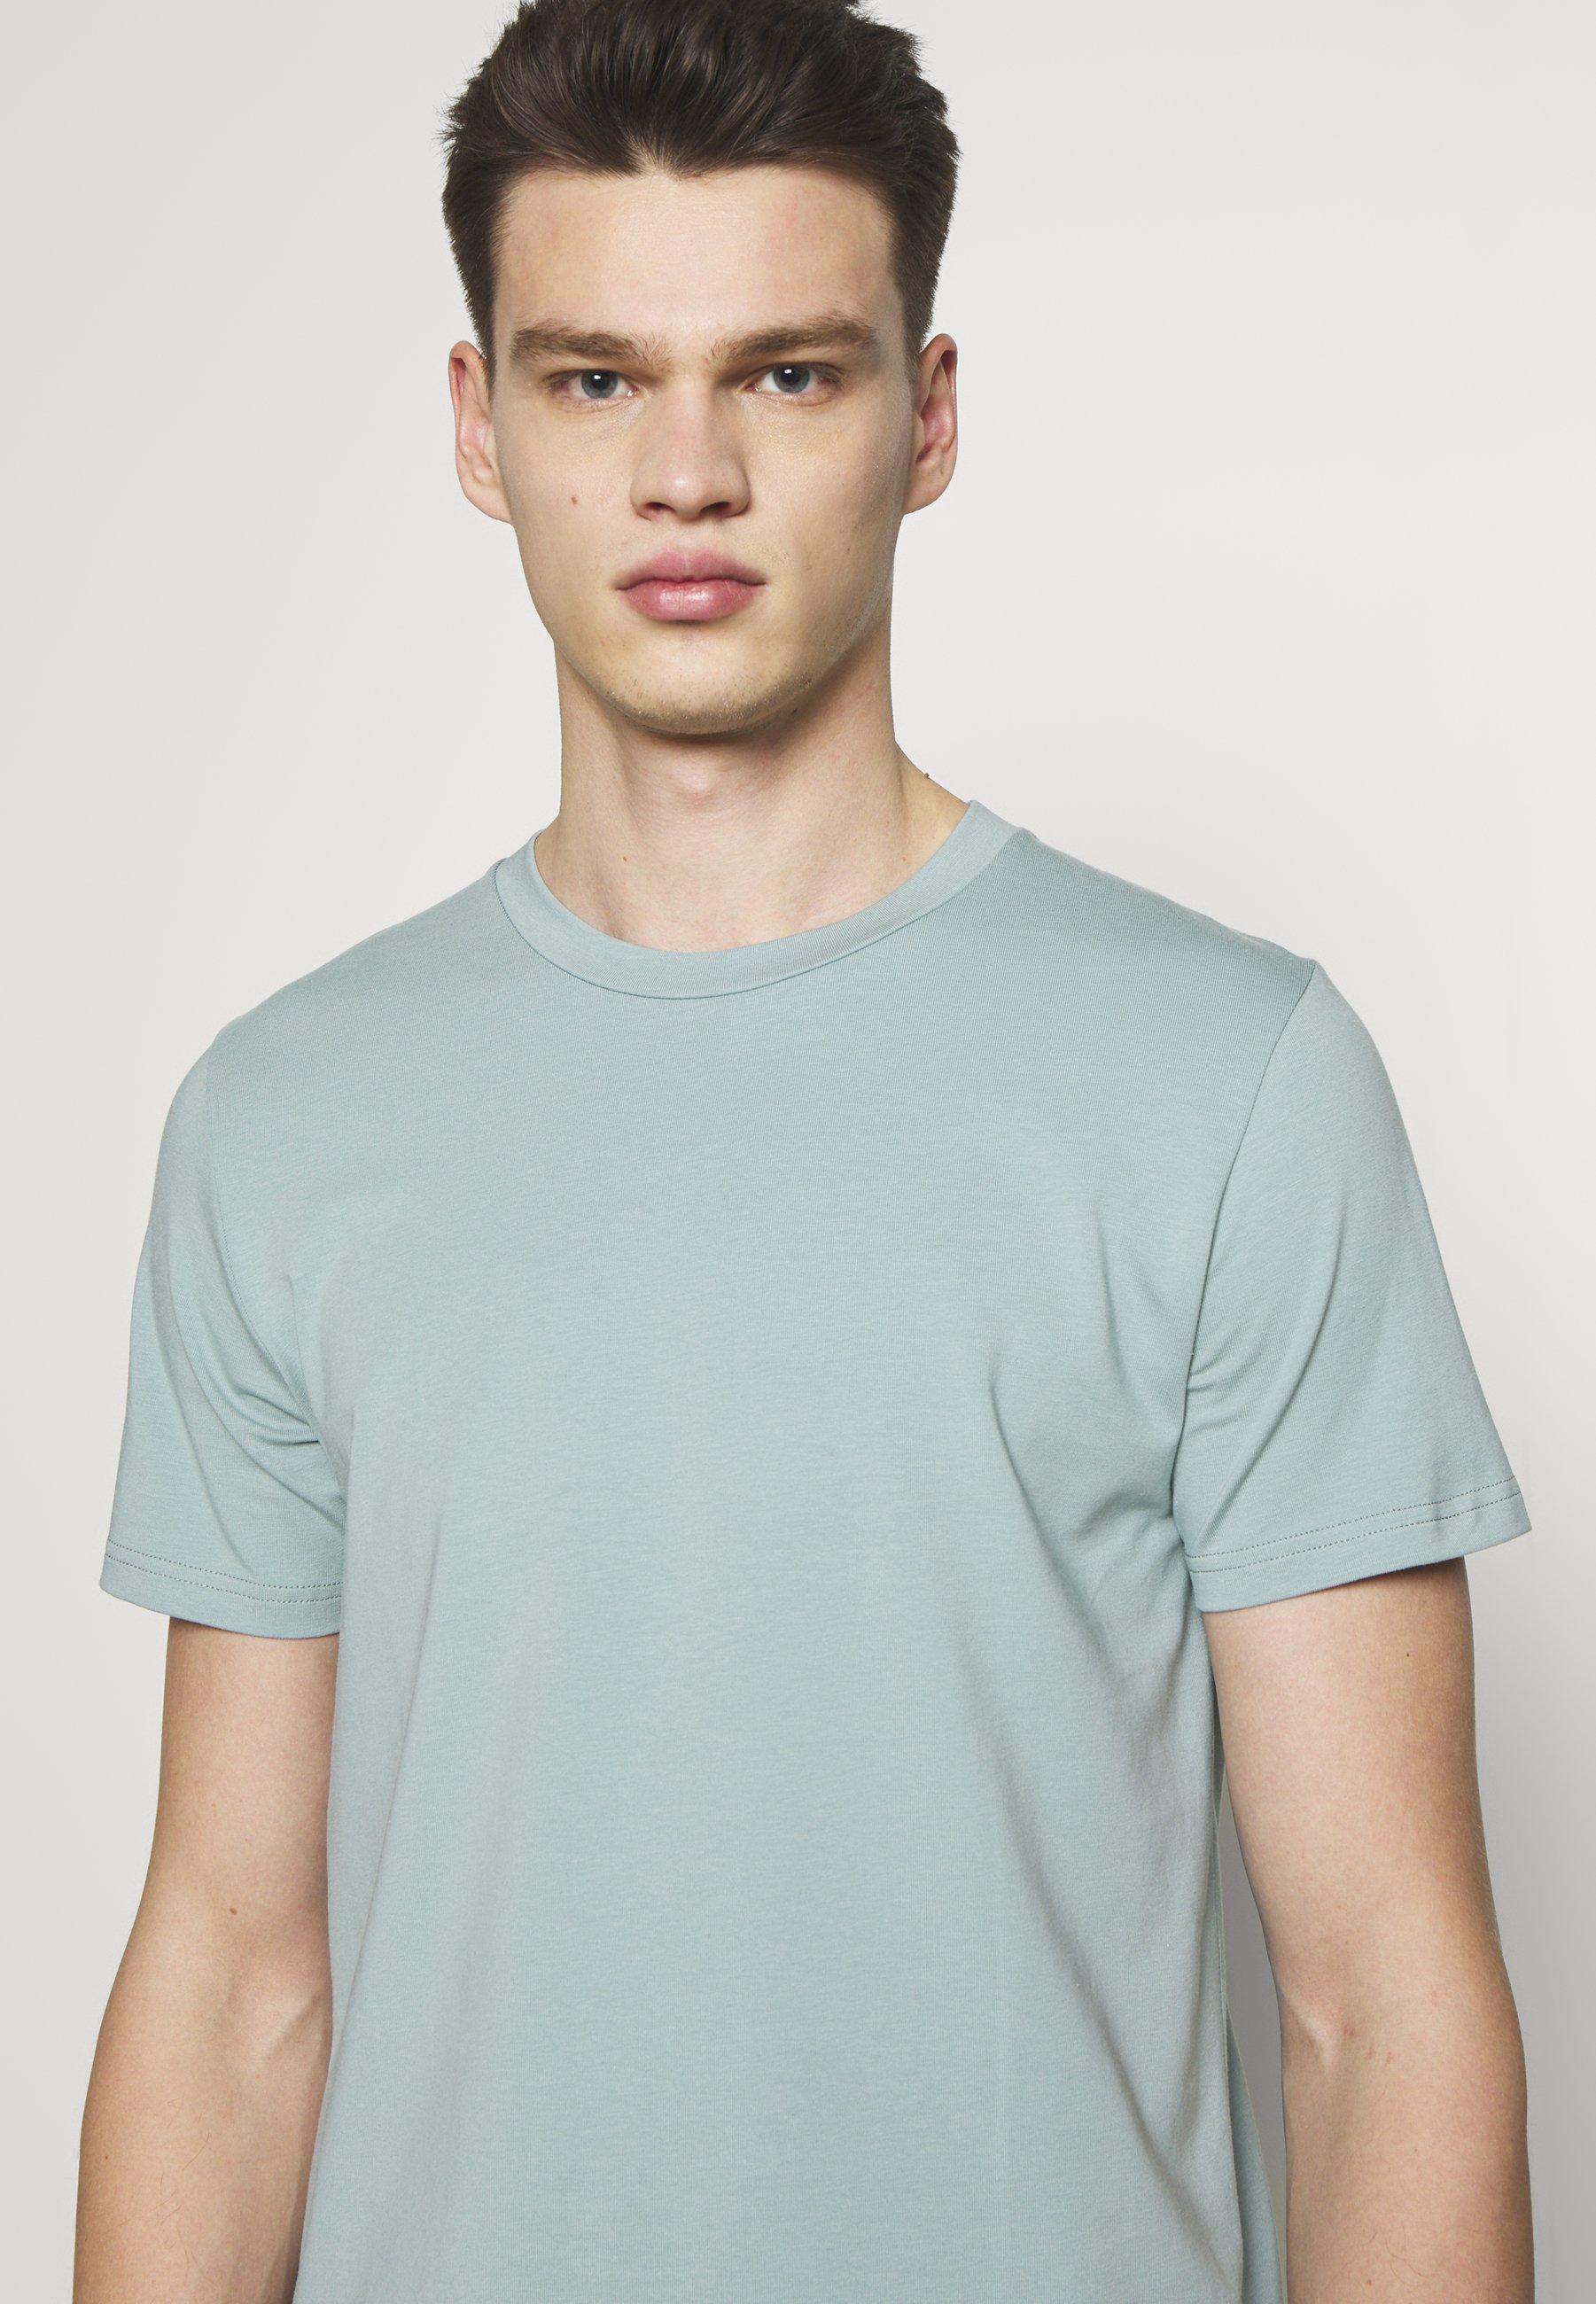 Hurtig Ekspres Opdateret Tøj til herrer Filippa K TEE T-shirts basic mint powder jWT5gw Q4WRin